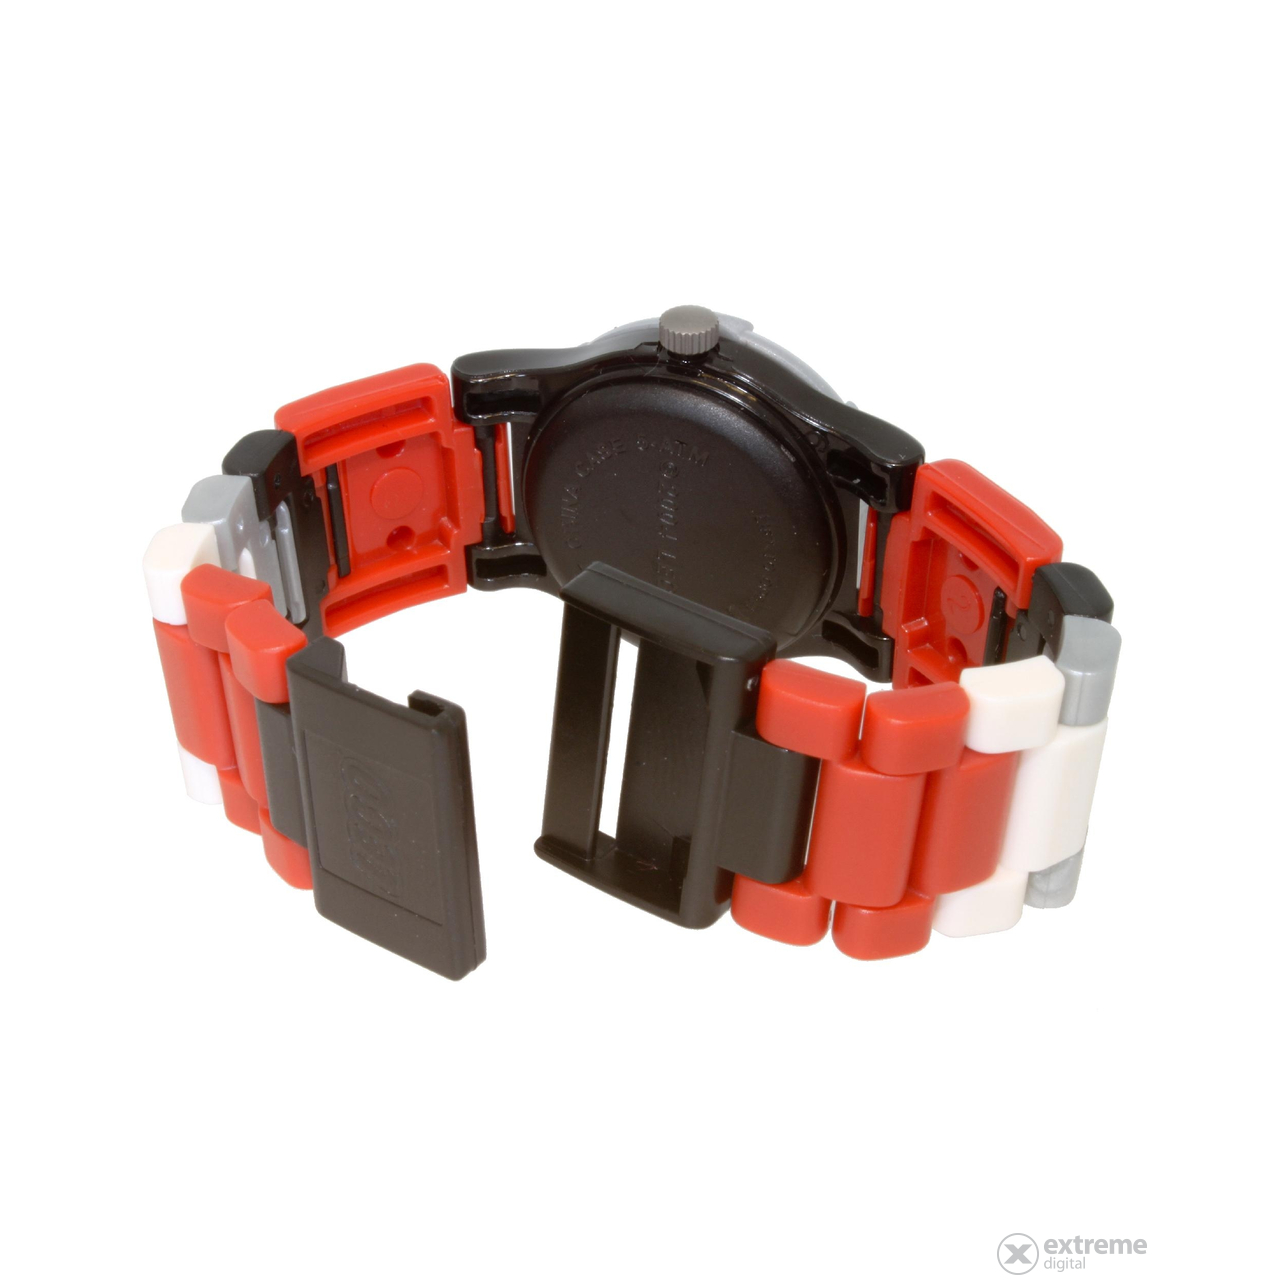 LEGO Star Wars - Darth Maul gyermek karóra  4c0ded79fb